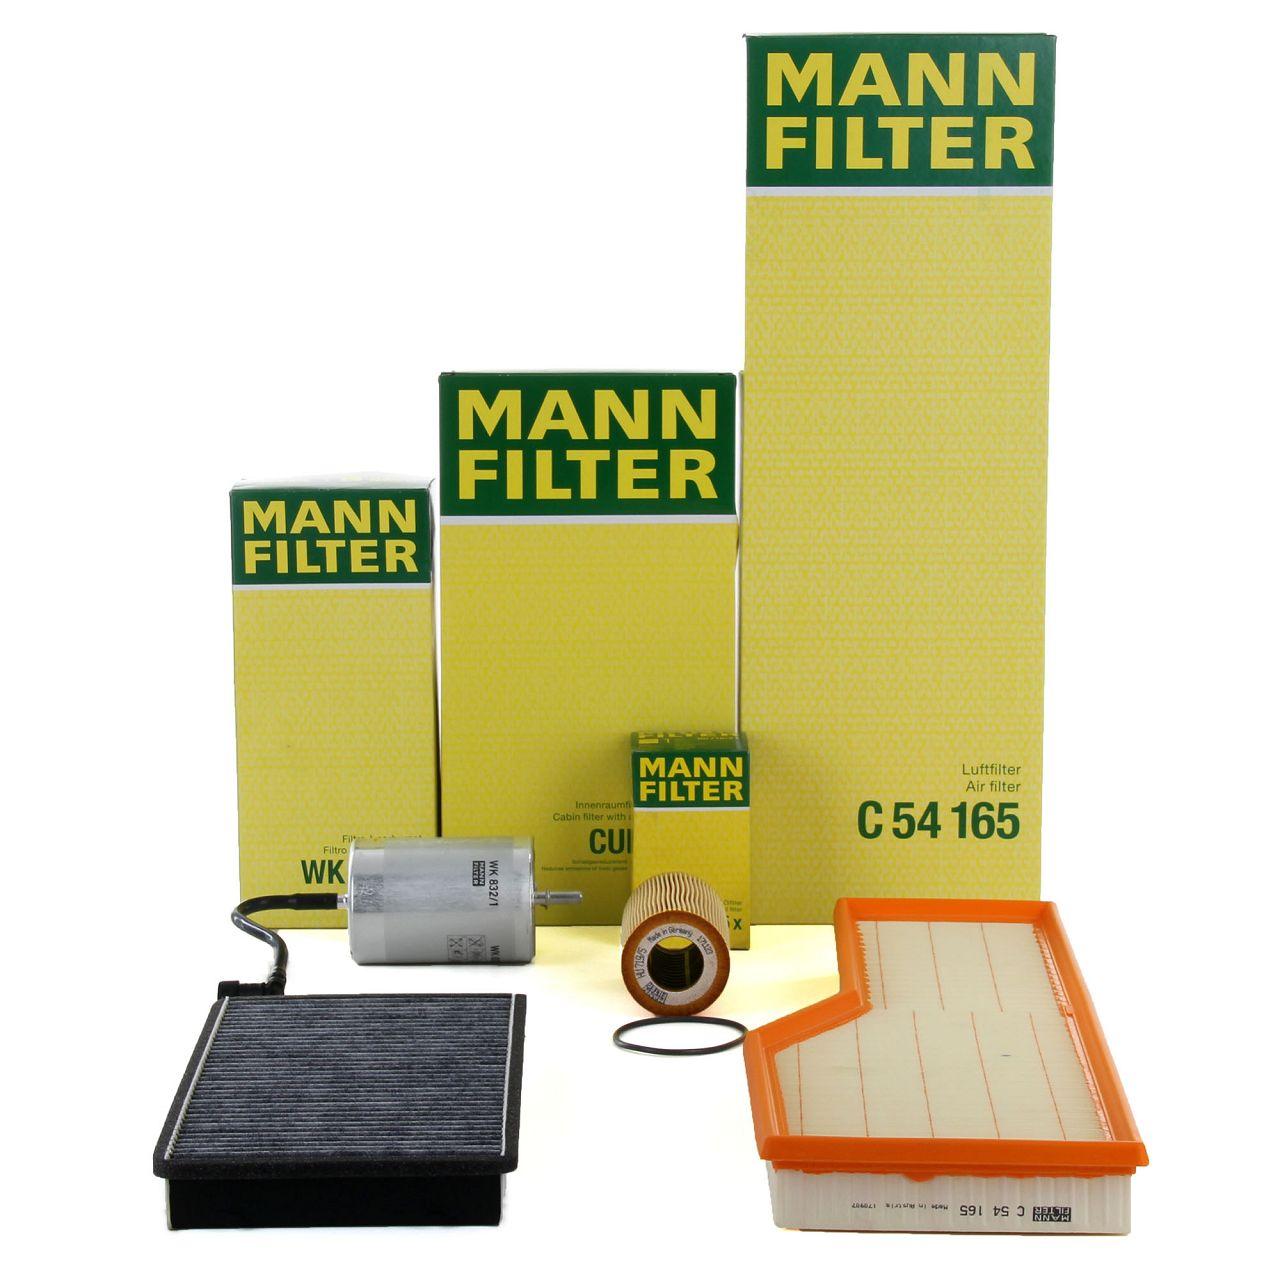 MANN Inspektionskit für PORSCHE 911 (996) 3.4 / 3.6 Carrera / S 301/320/345 PS